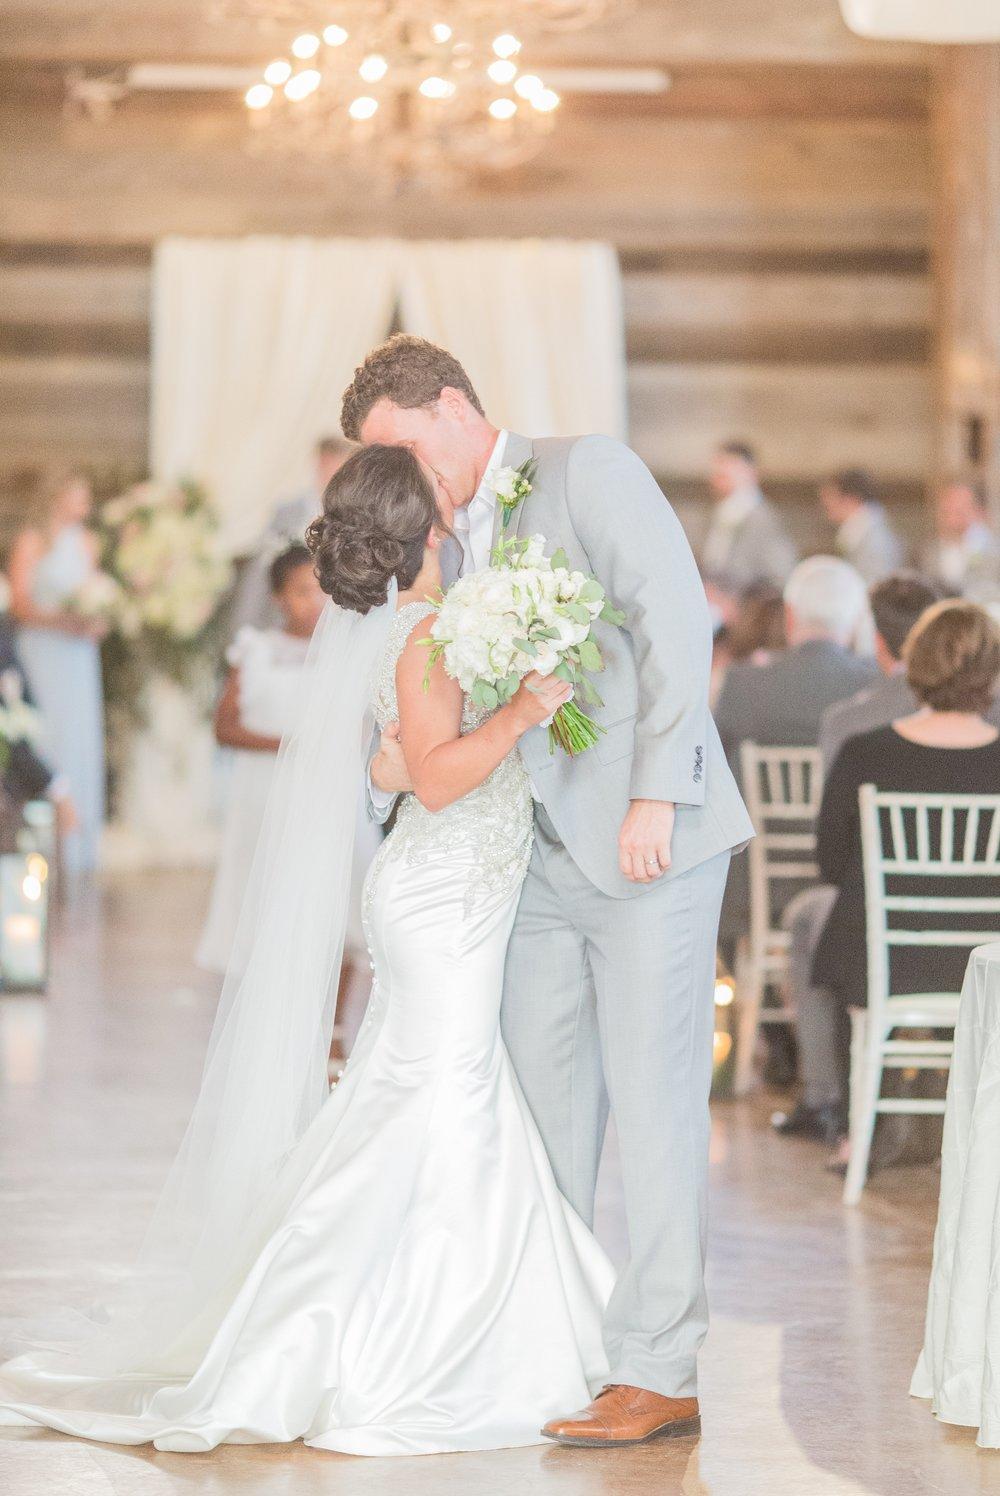 bridlewood-of-madison-mississippi-wedding 52.jpg